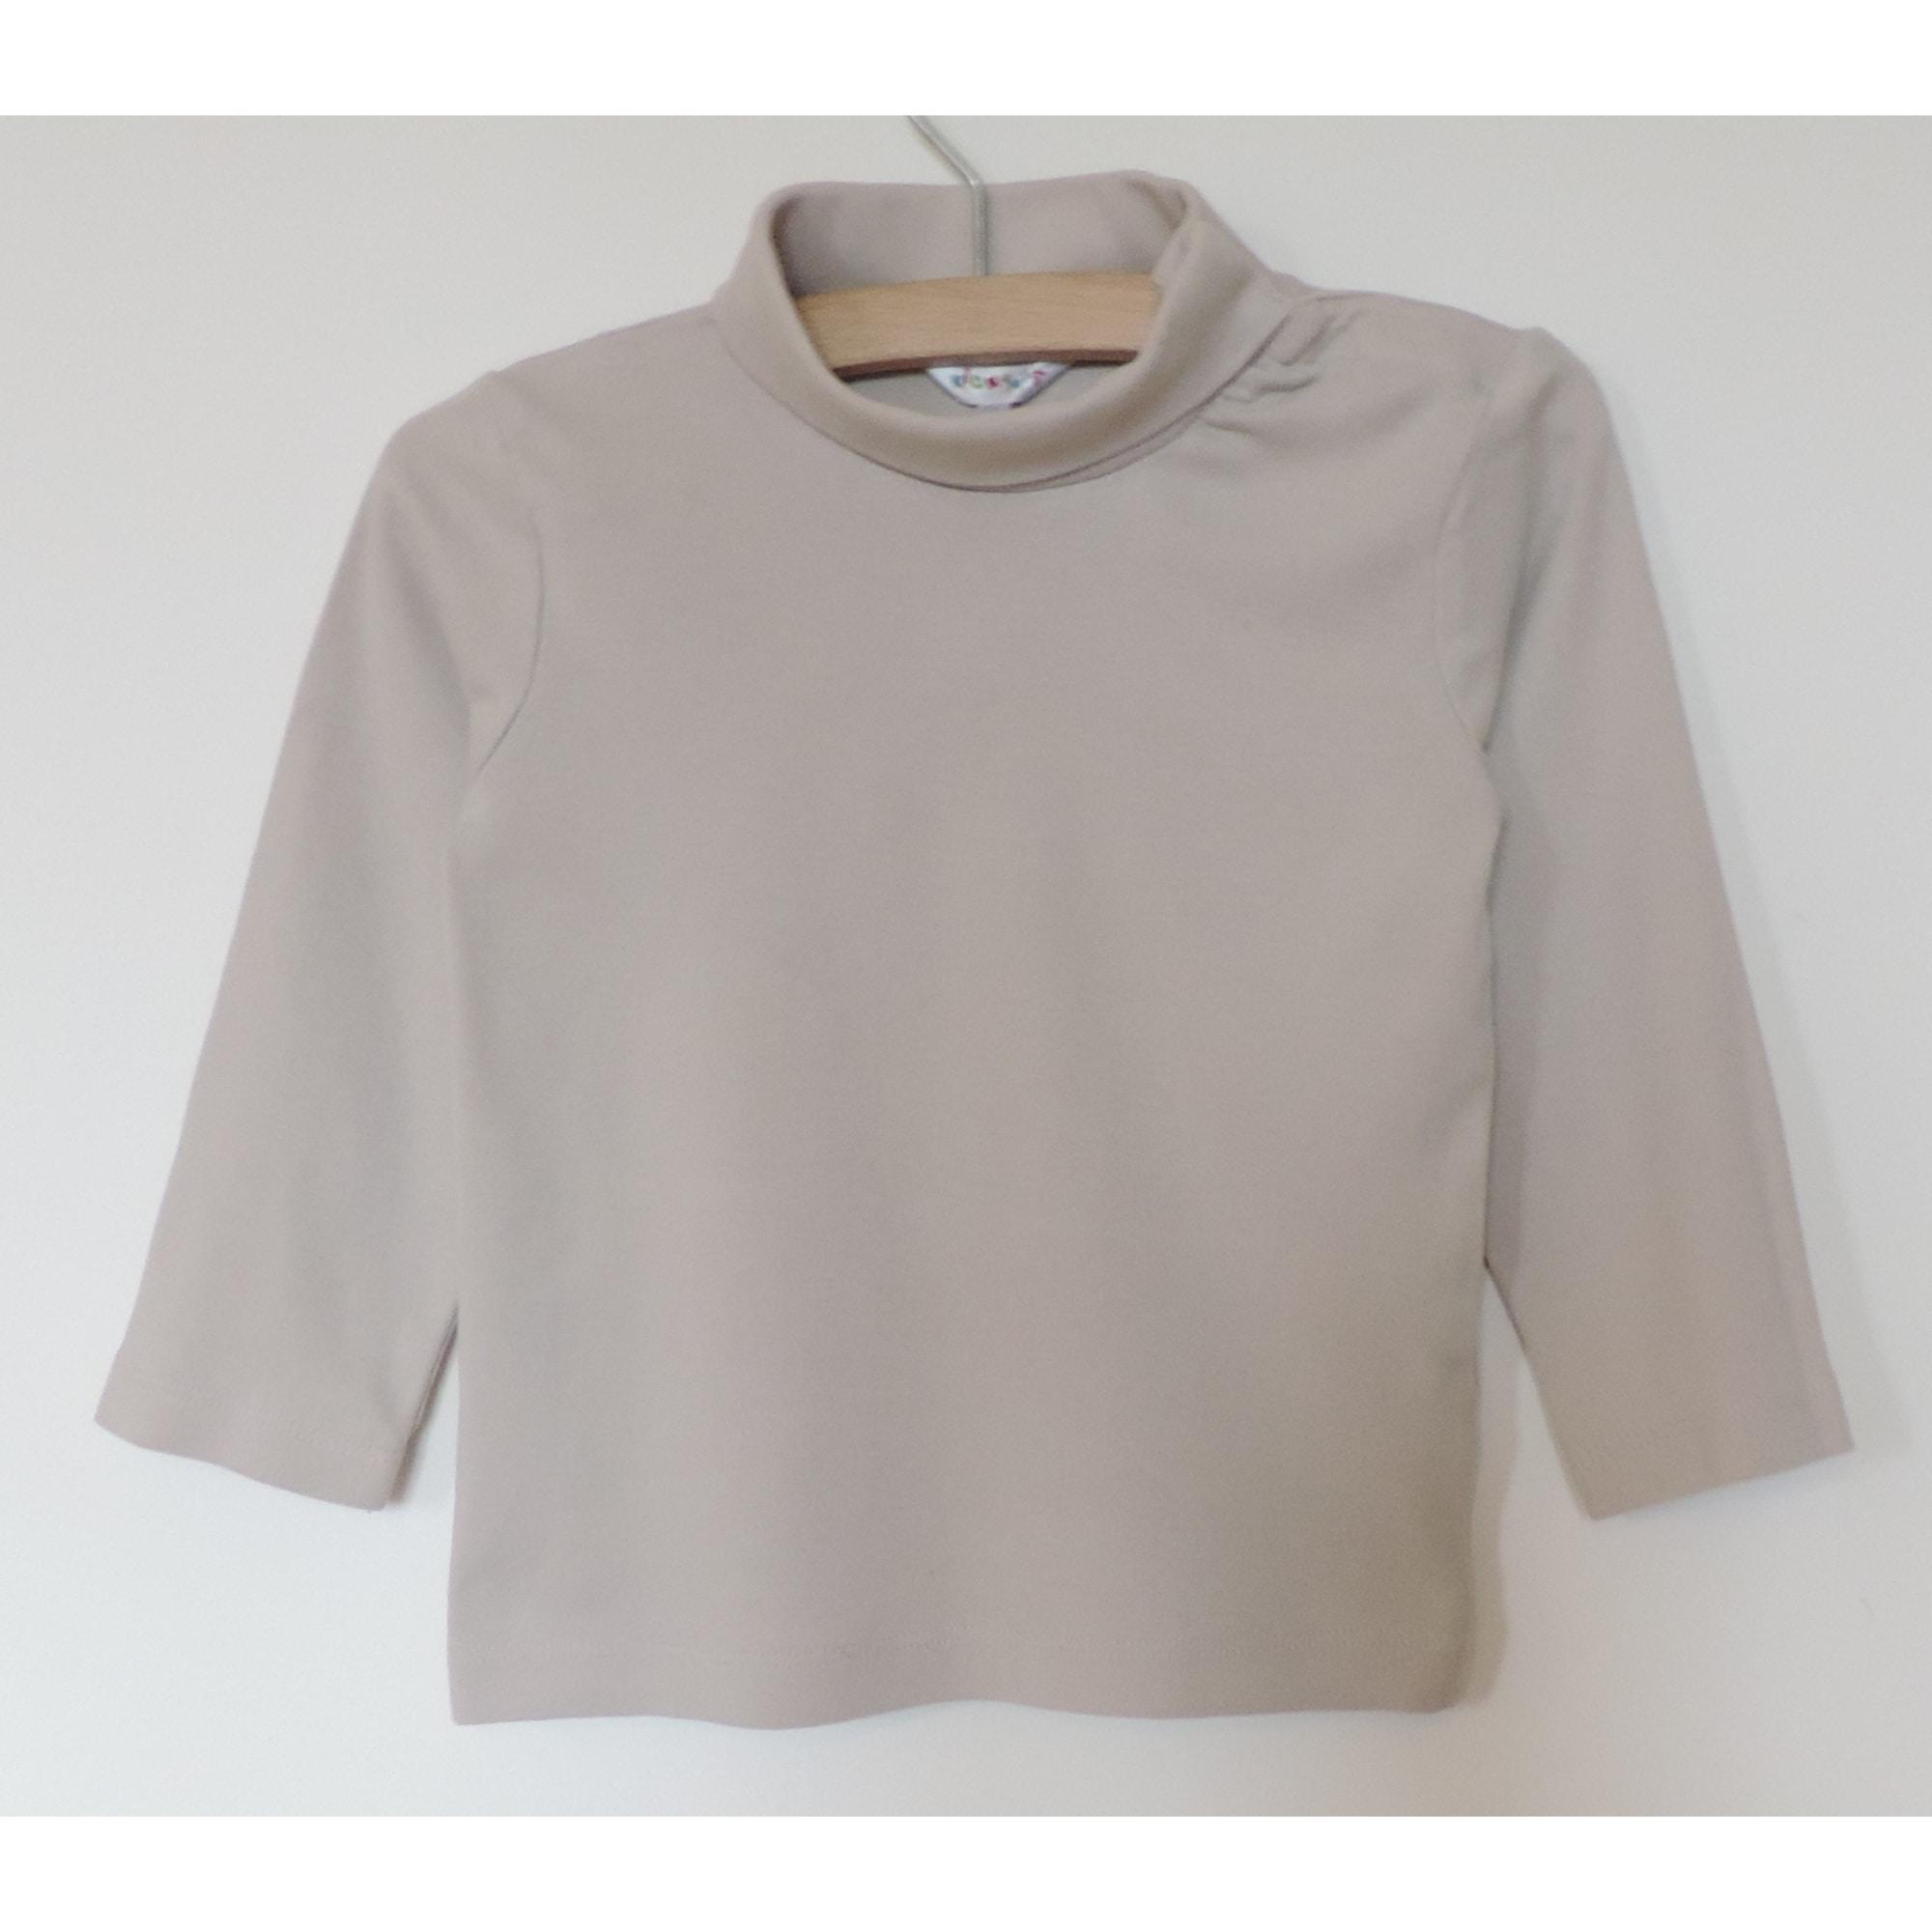 Tee-shirt KIDKANAI Beige, camel